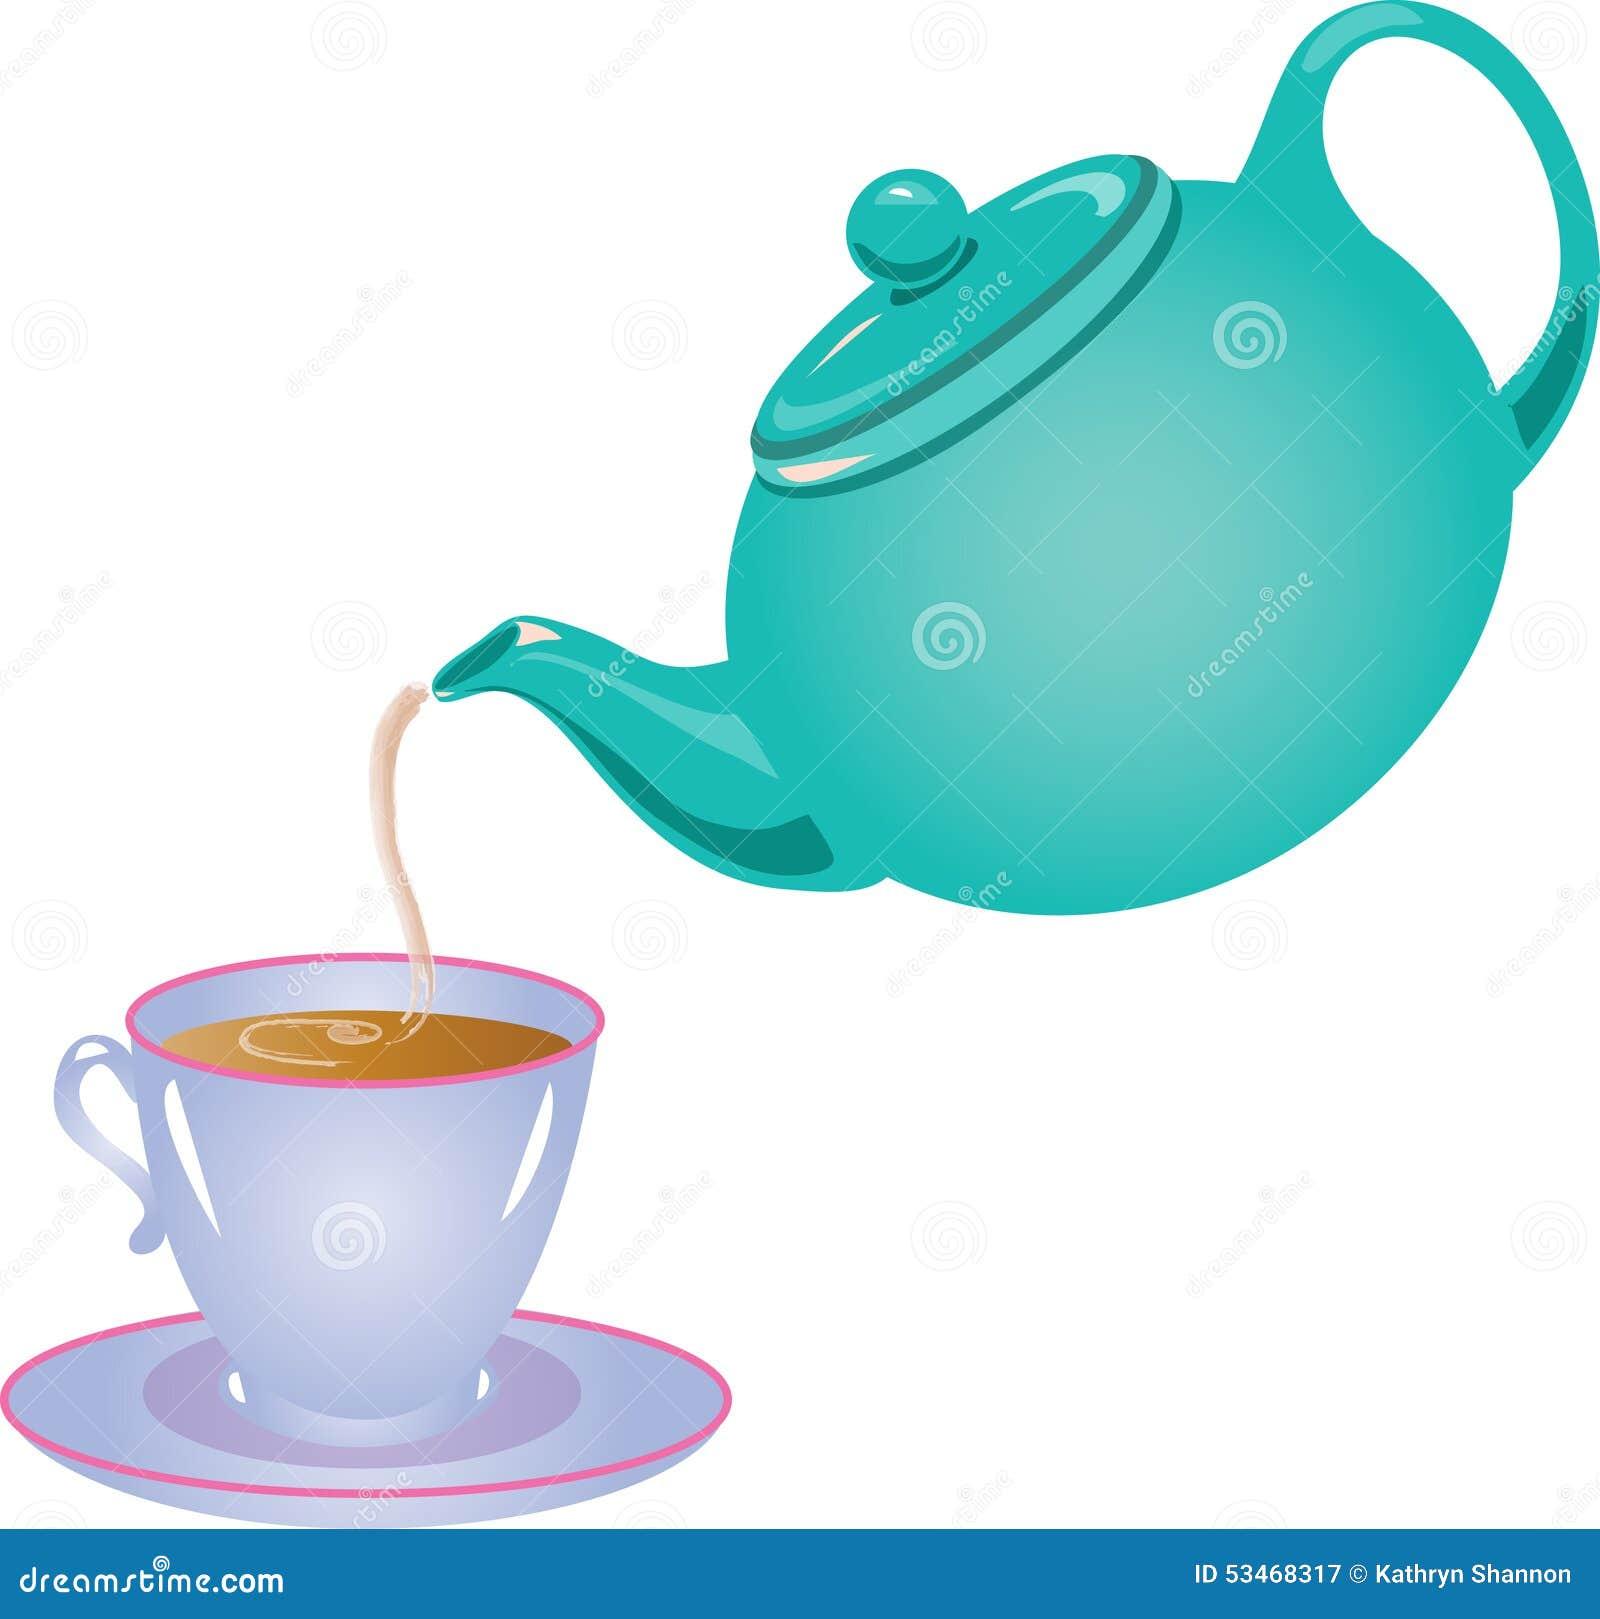 Tea Pot Pouring Tea Stock Vector Illustration Of Brew 53468317